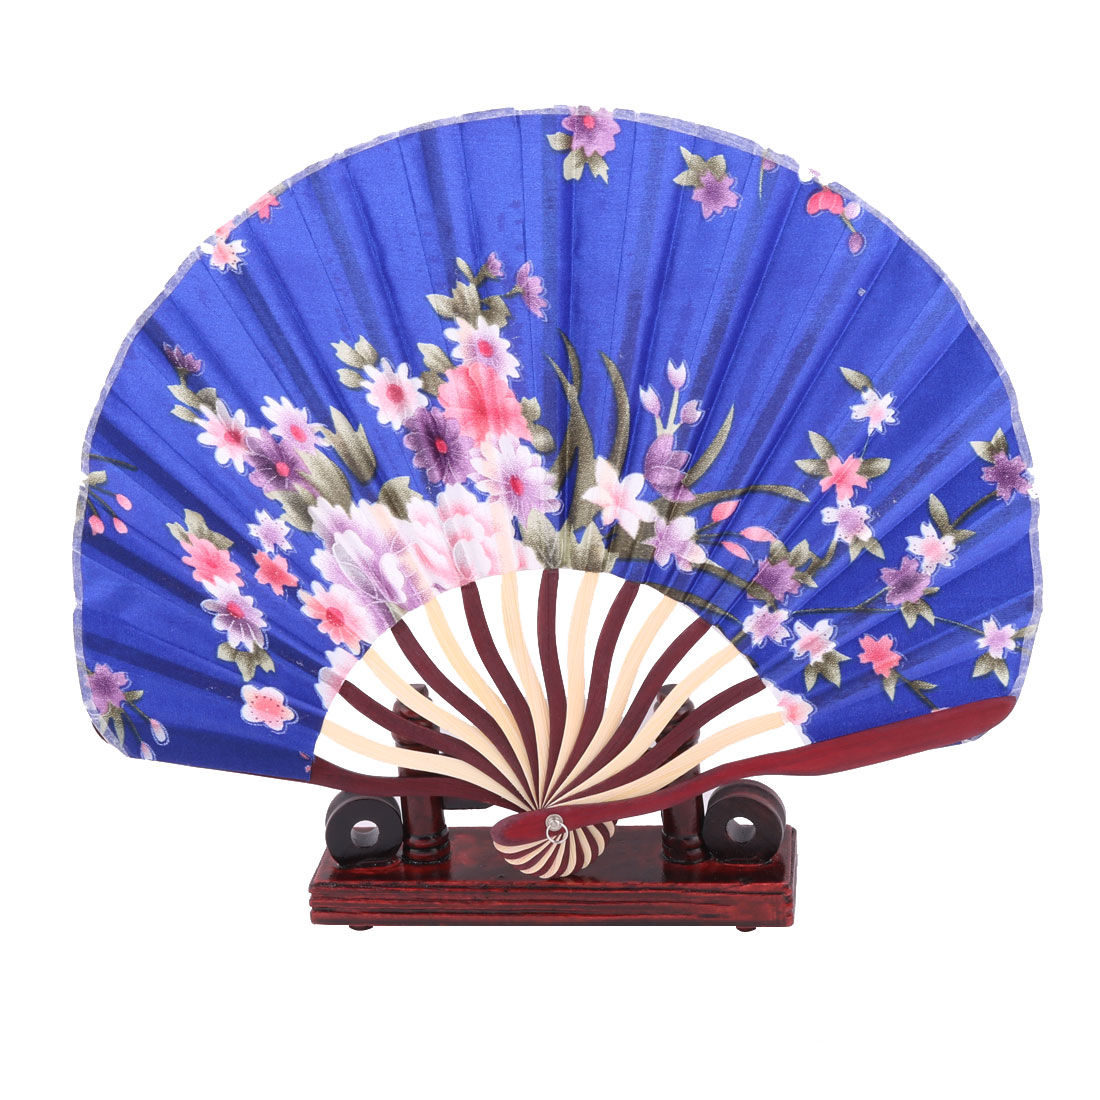 Home Wood Frame Flower Pattern Folding Hand Fan Display Holder Decor Multicolor 2 in 1